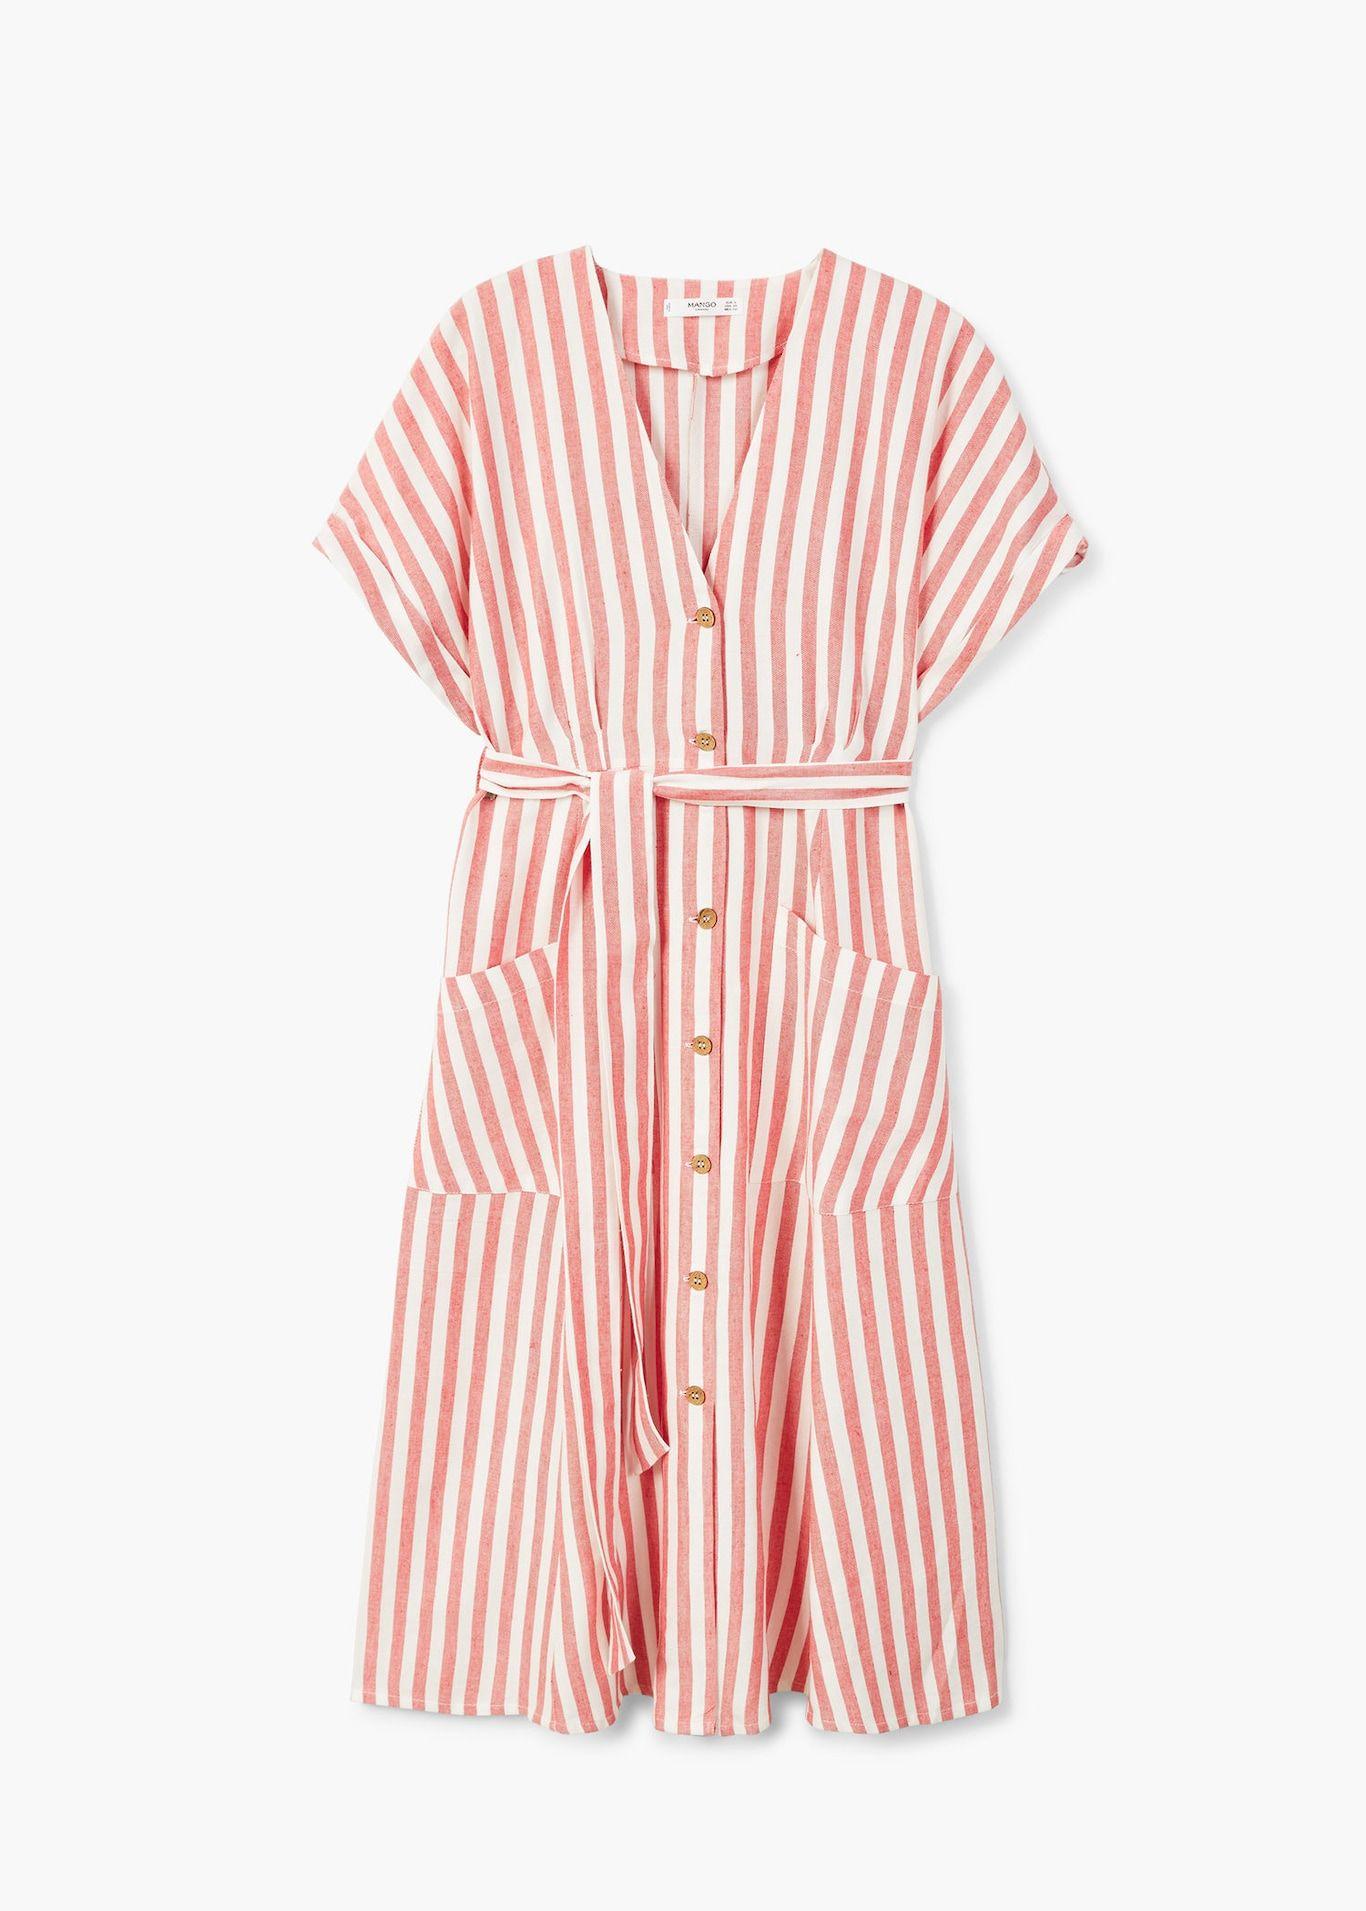 643d27a709c Striped cotton dress - Women in 2019